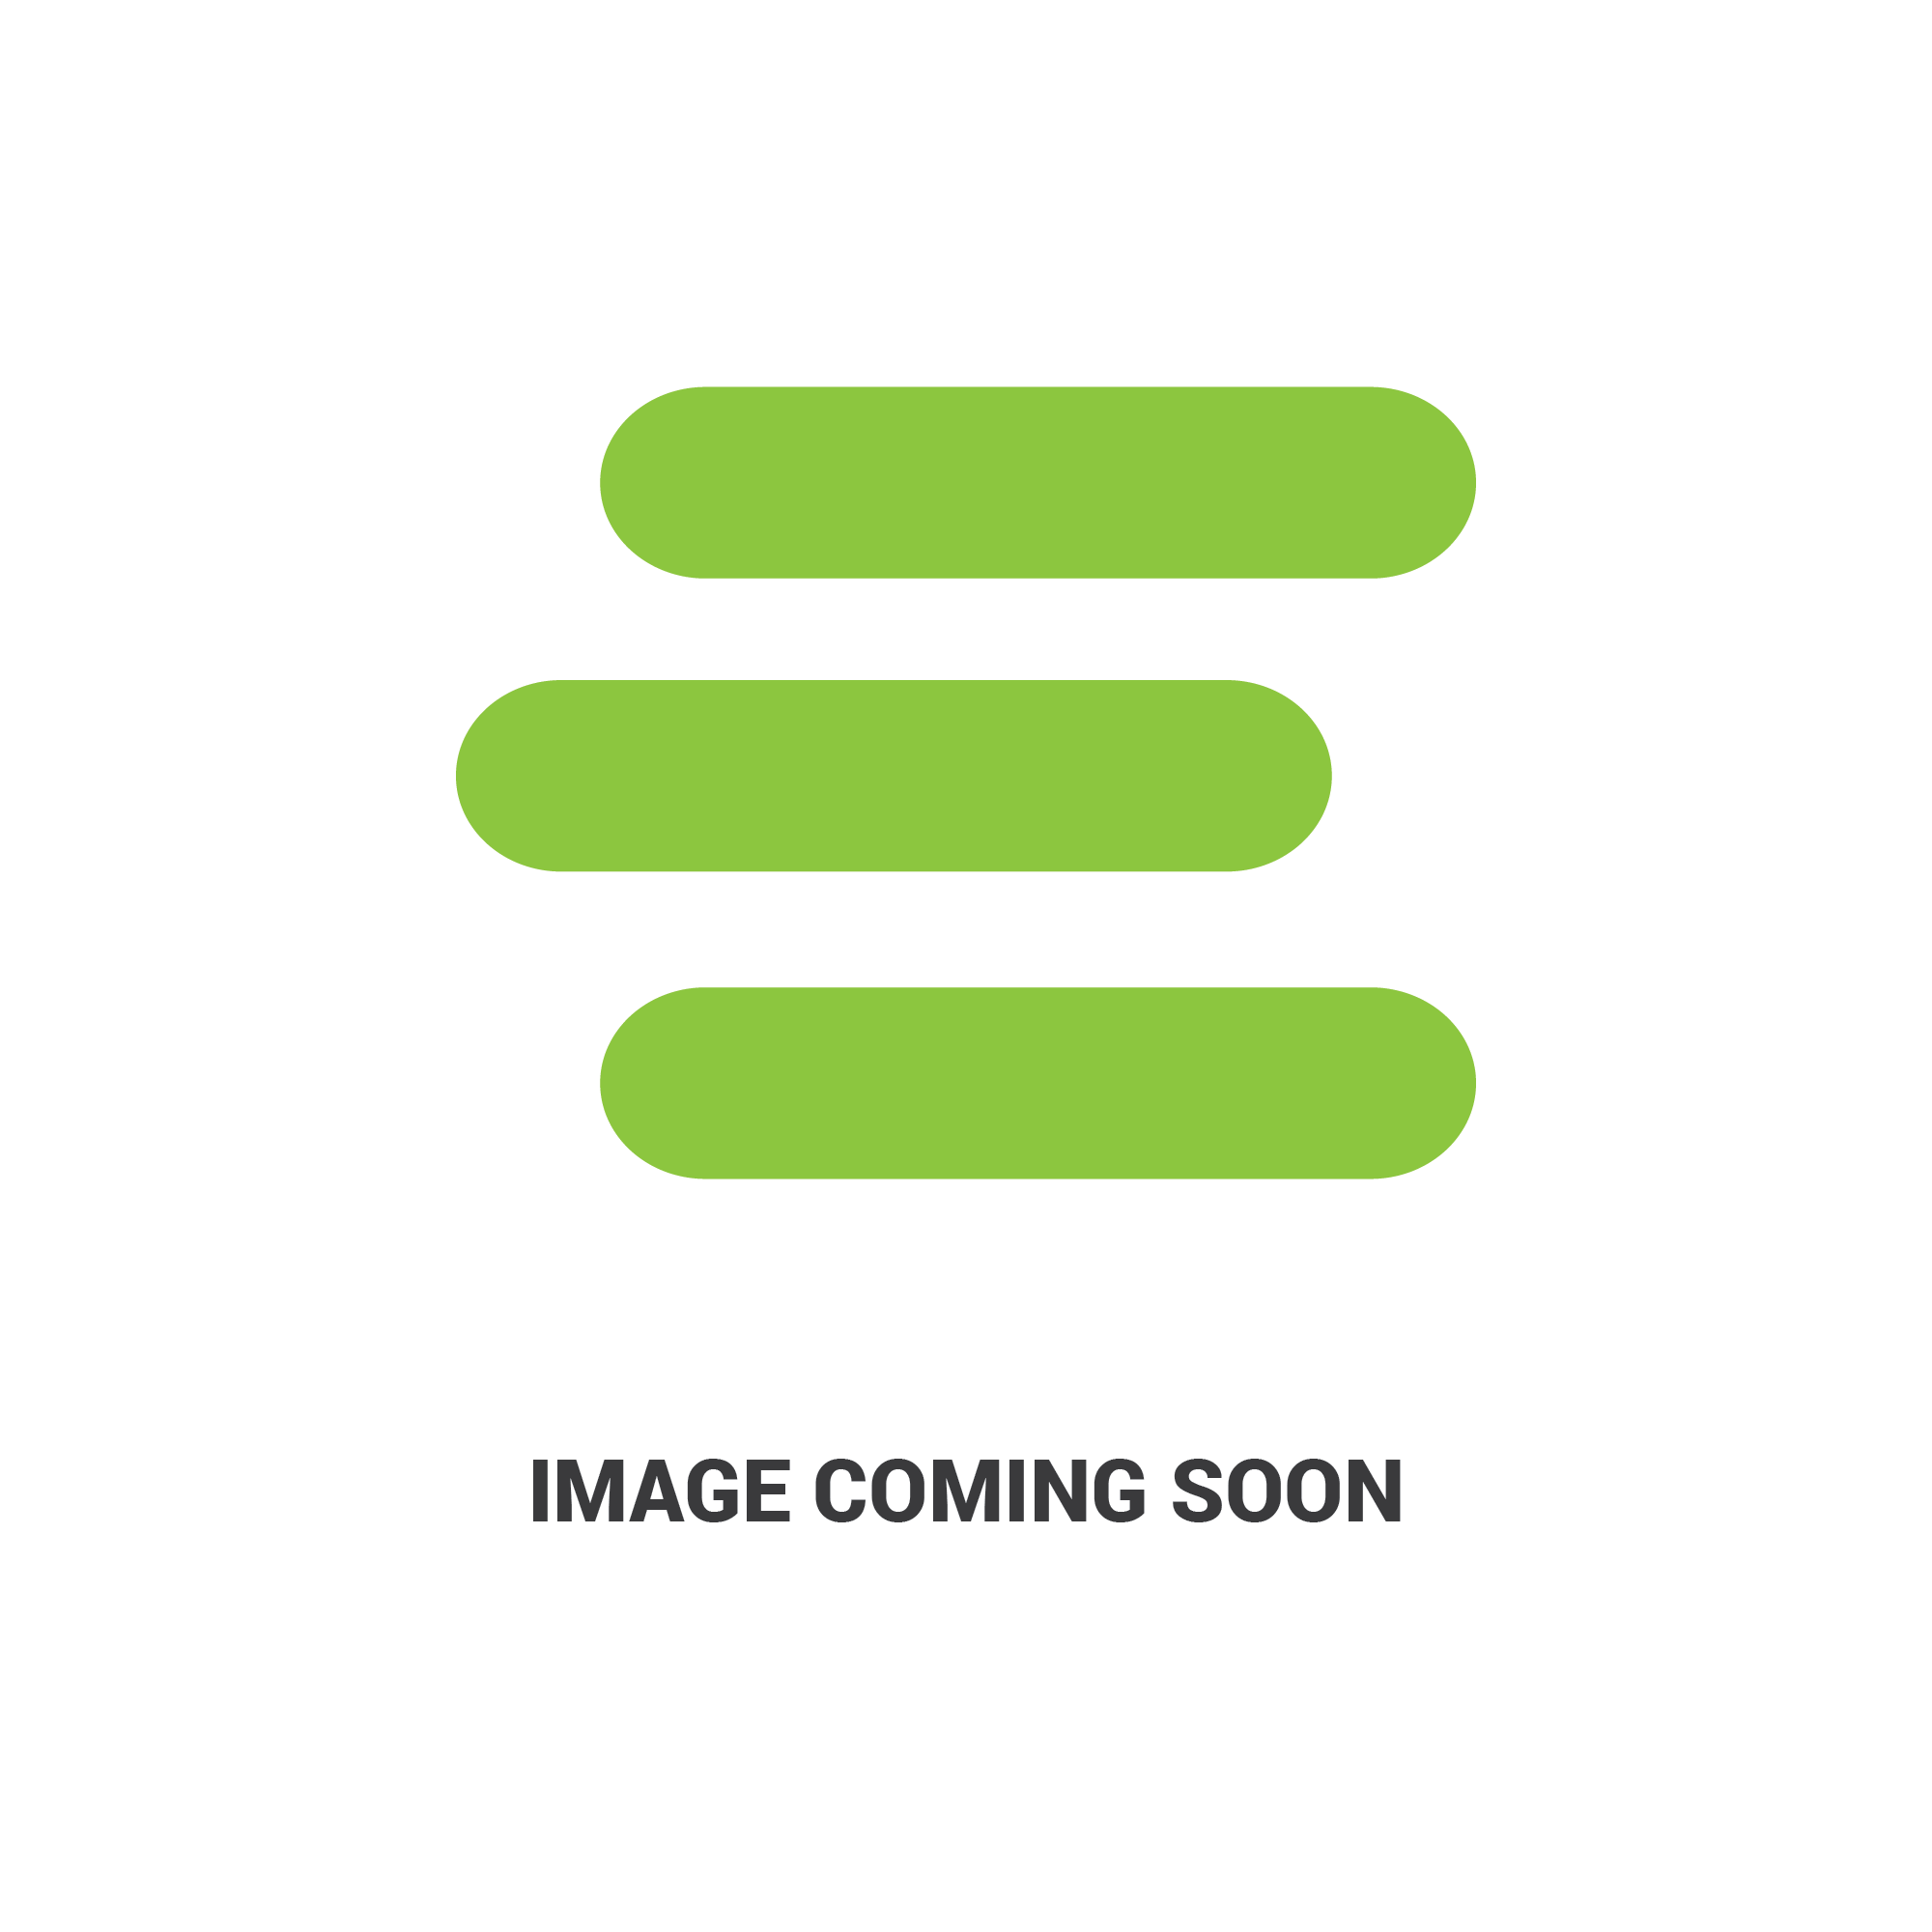 E-66103-459201981_1.jpg